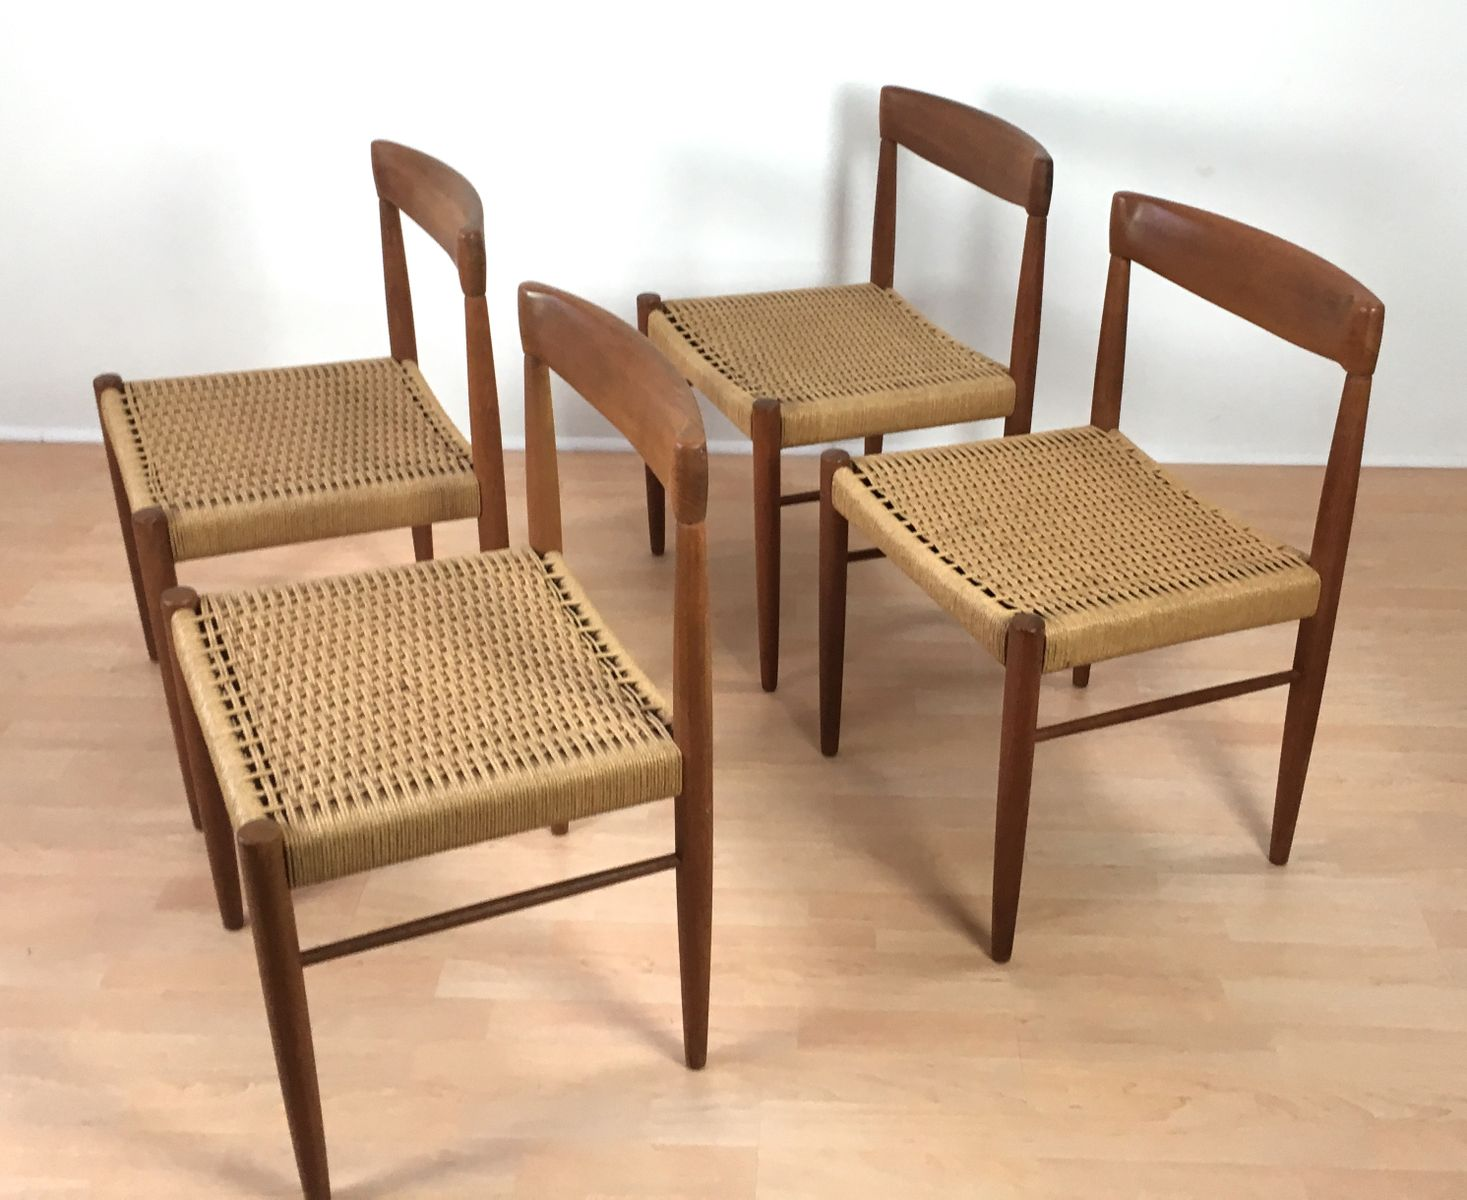 d nische st hle von h w klein f r bramin 1960er 4er set bei pamono kaufen. Black Bedroom Furniture Sets. Home Design Ideas